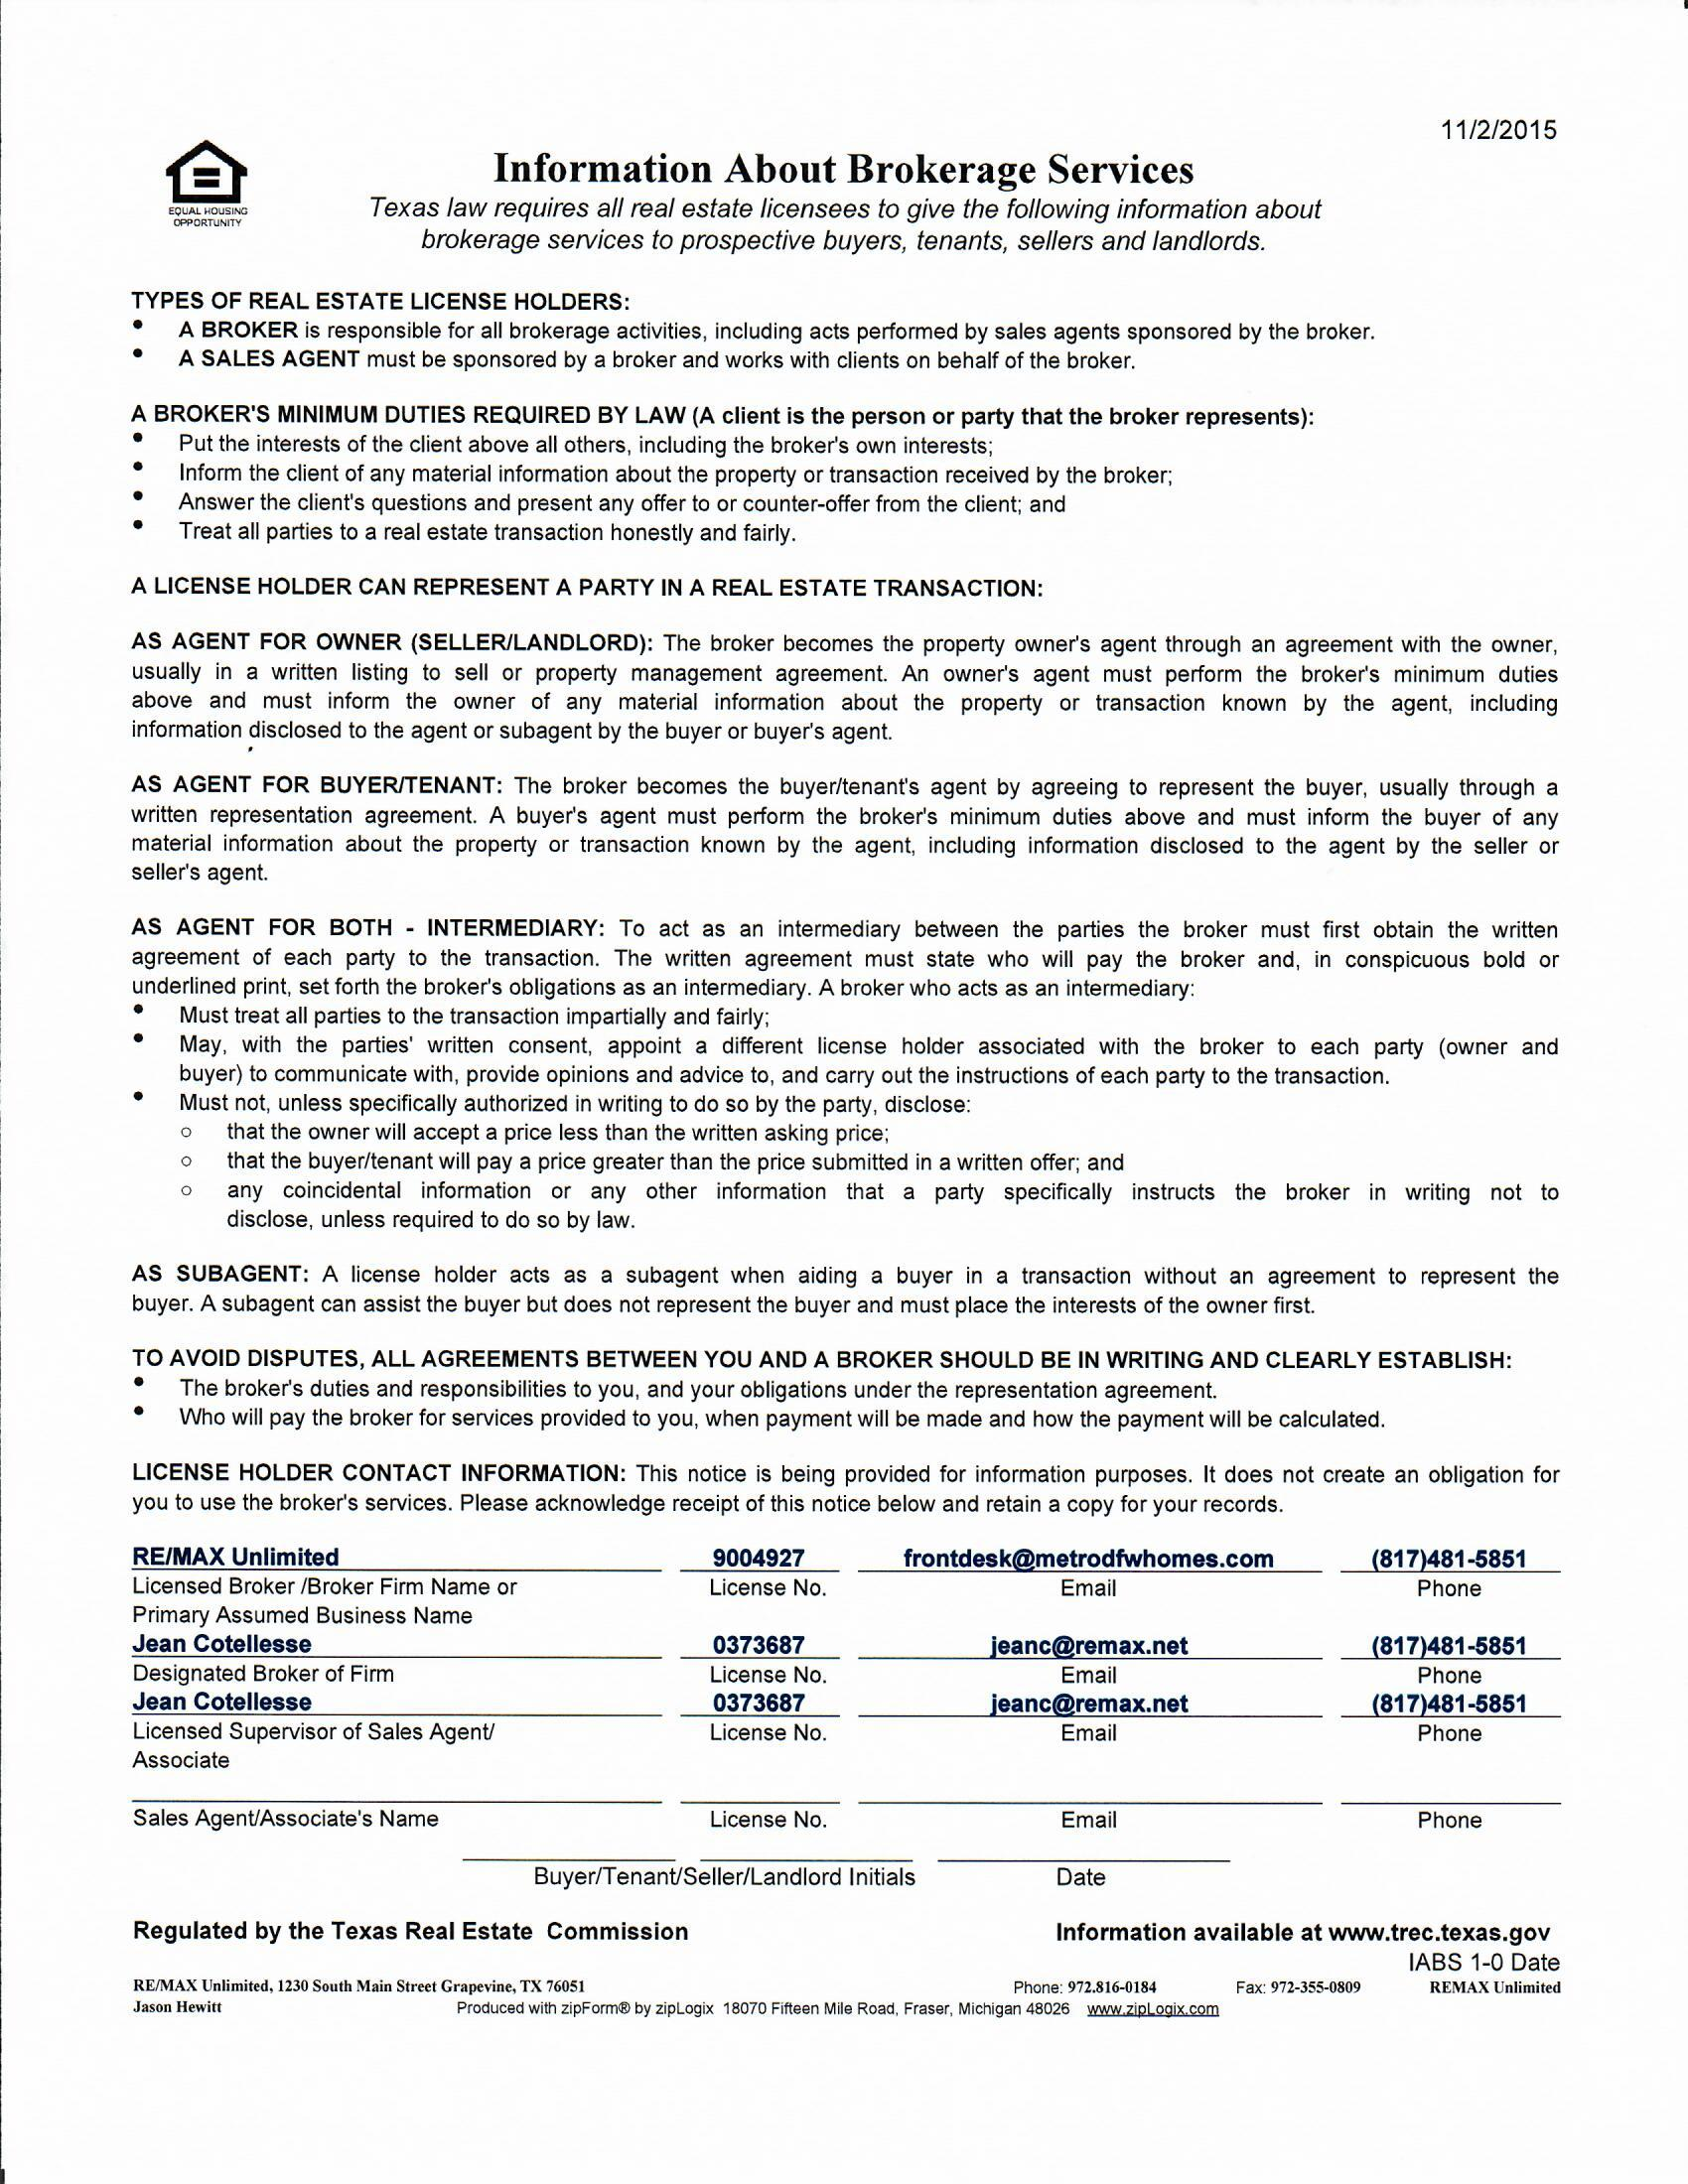 Trec Information About Brokerage Services Notice Remax